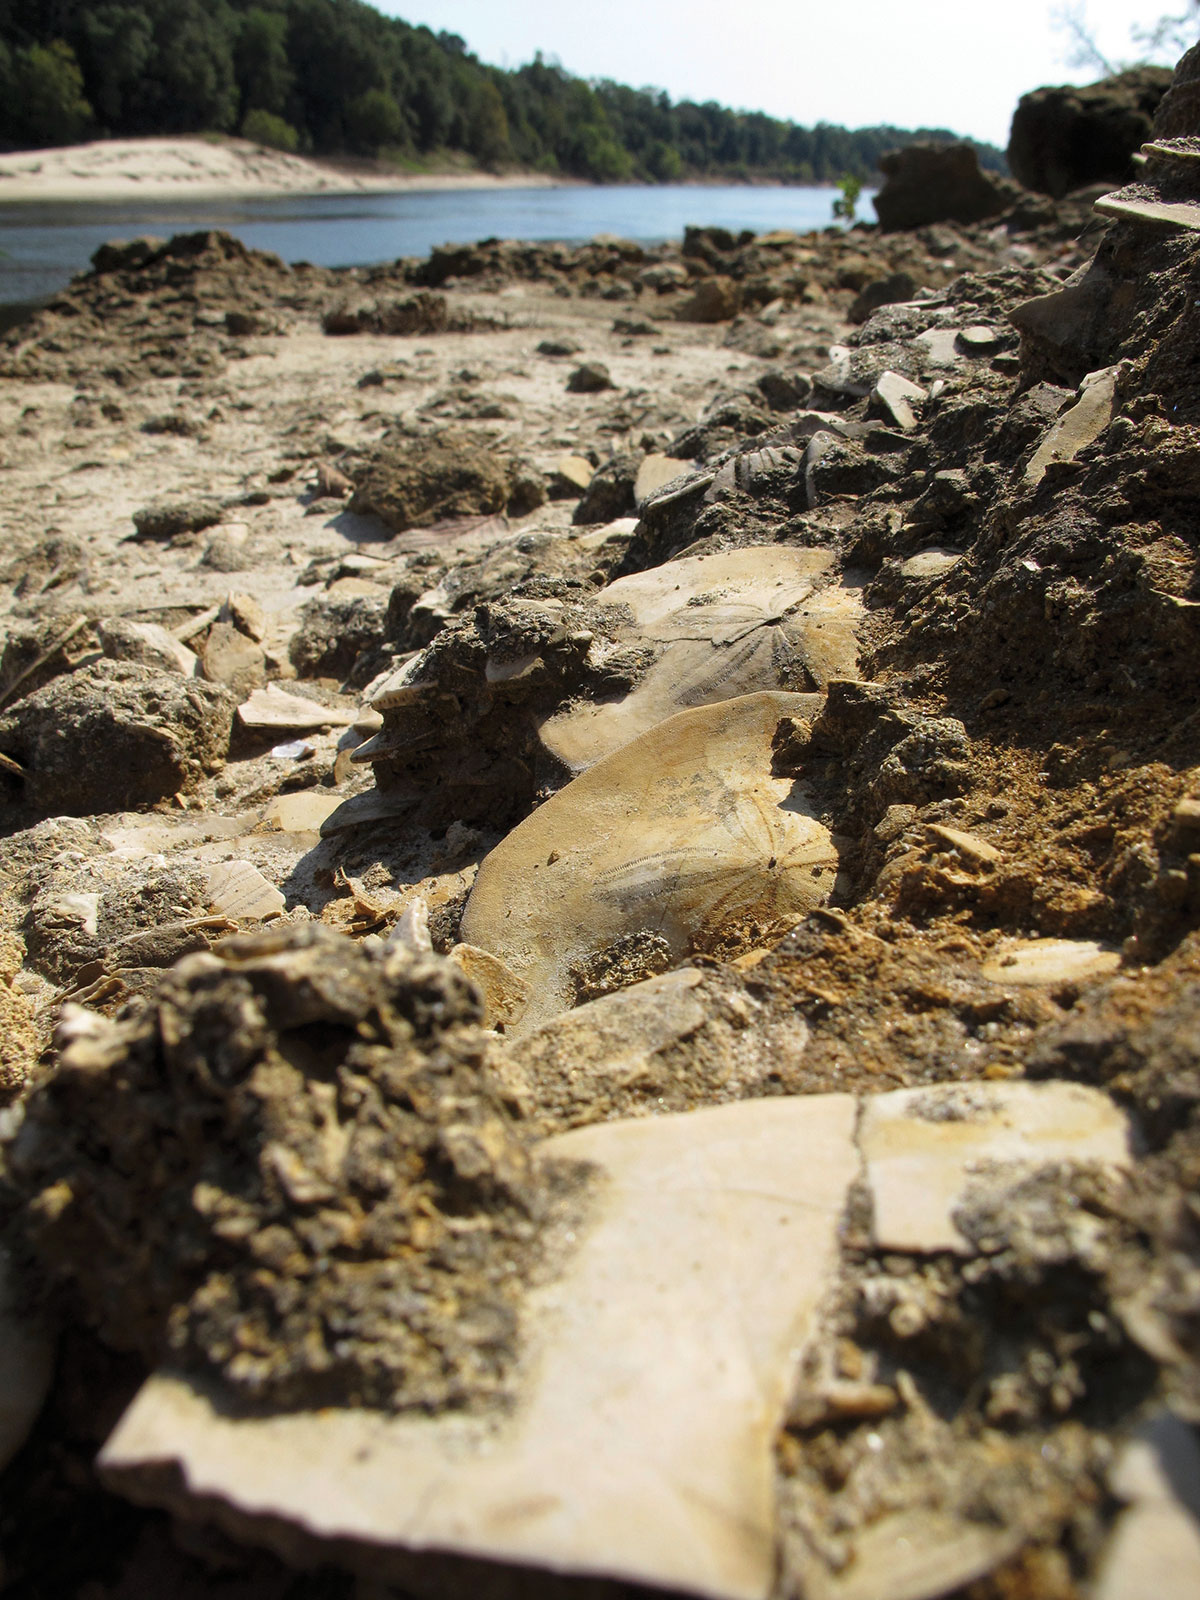 Sand dollars along the river bank